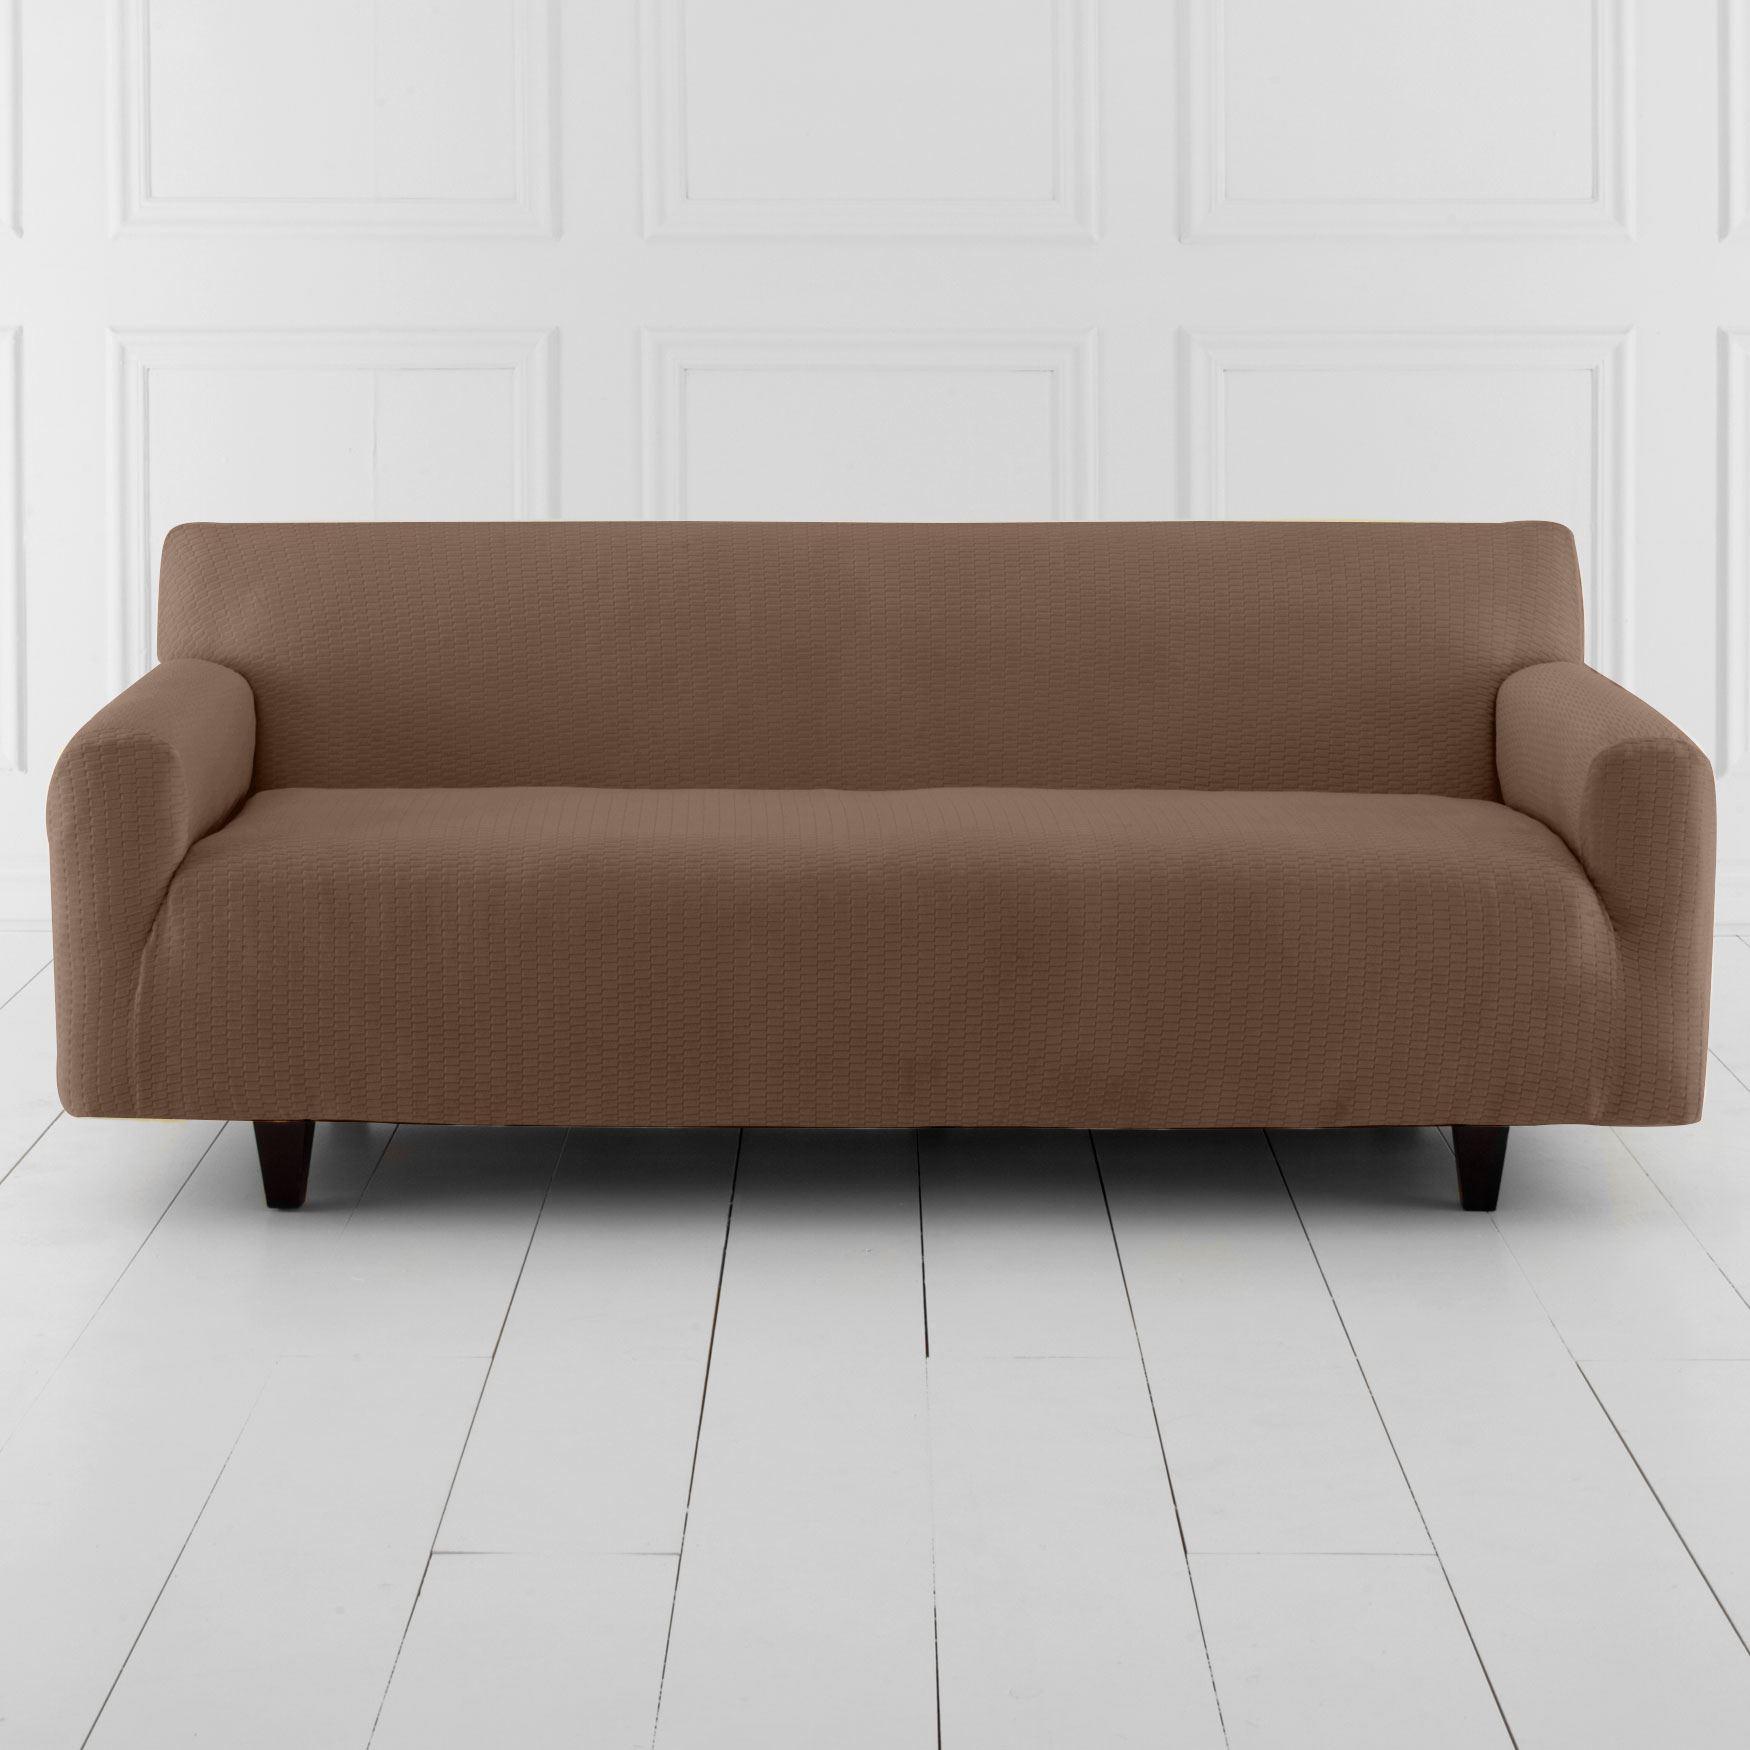 extra long sofa slipcover corner bed new york bh studio brighton plus size